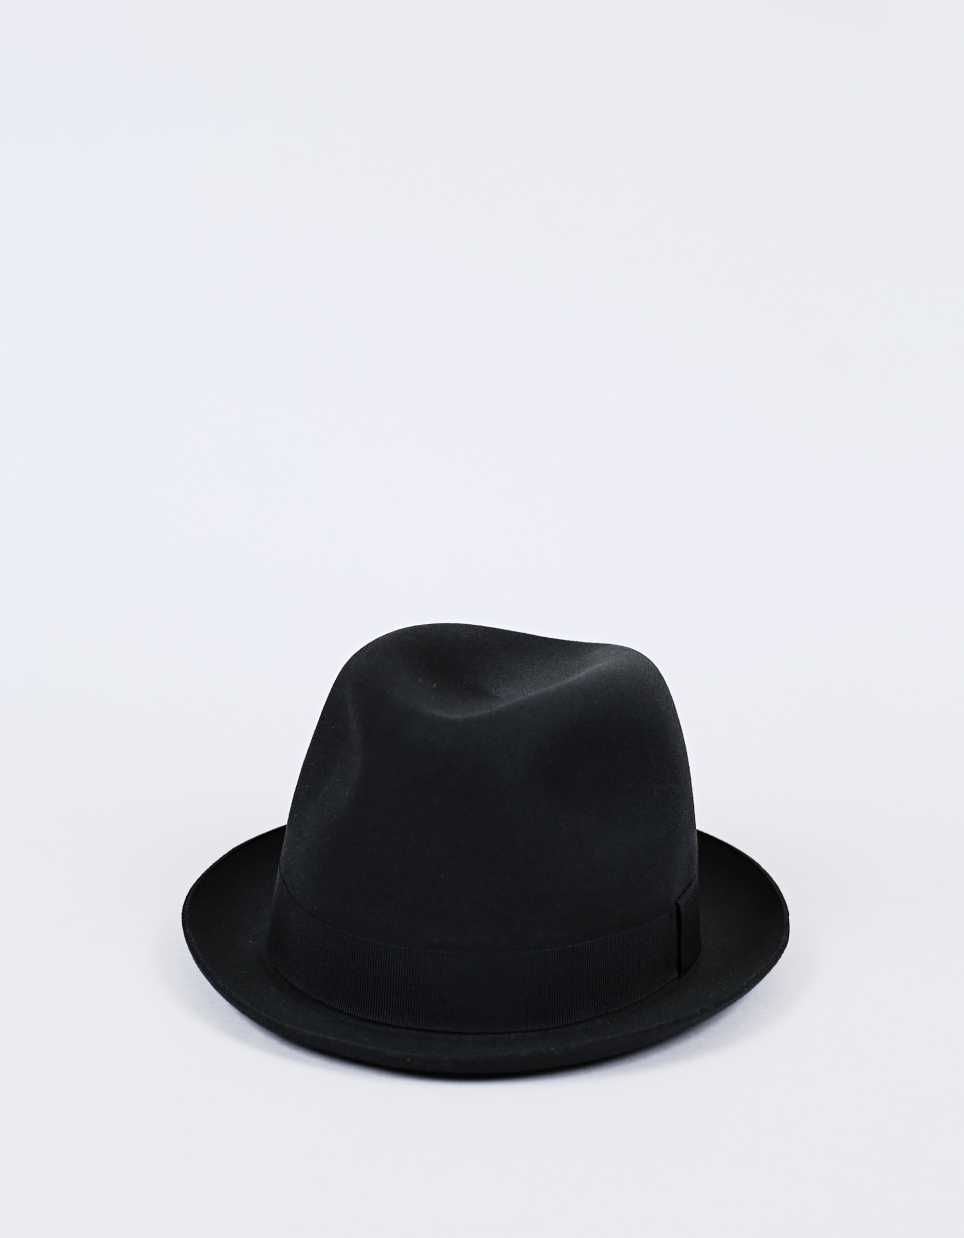 Barbisio Pichler Rabbit Felt Hat Black - Nitty Gritty Store